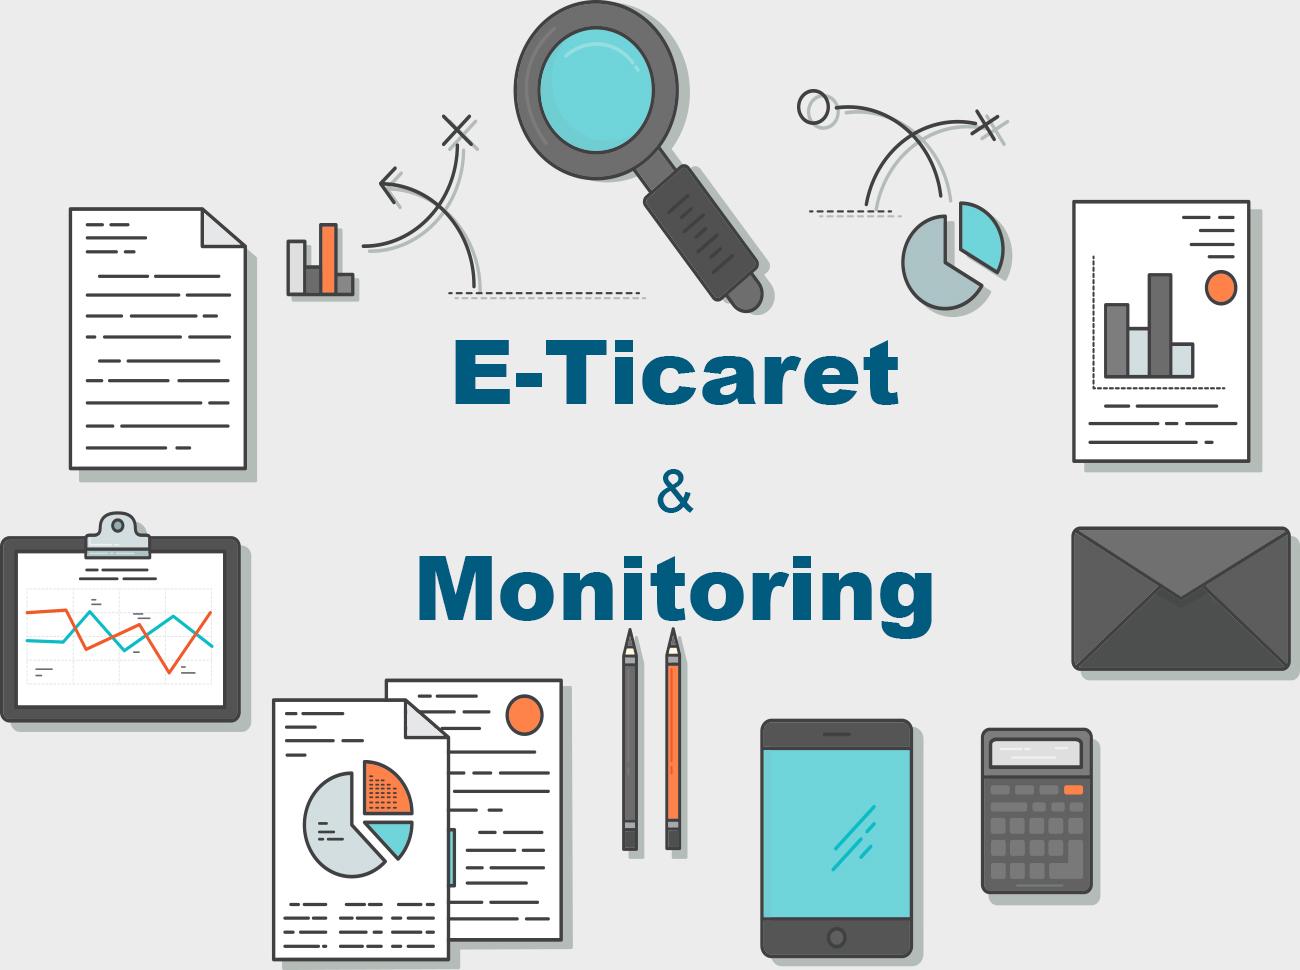 E-ticaret Rakiplerinizi İzleyin (Monitoring)